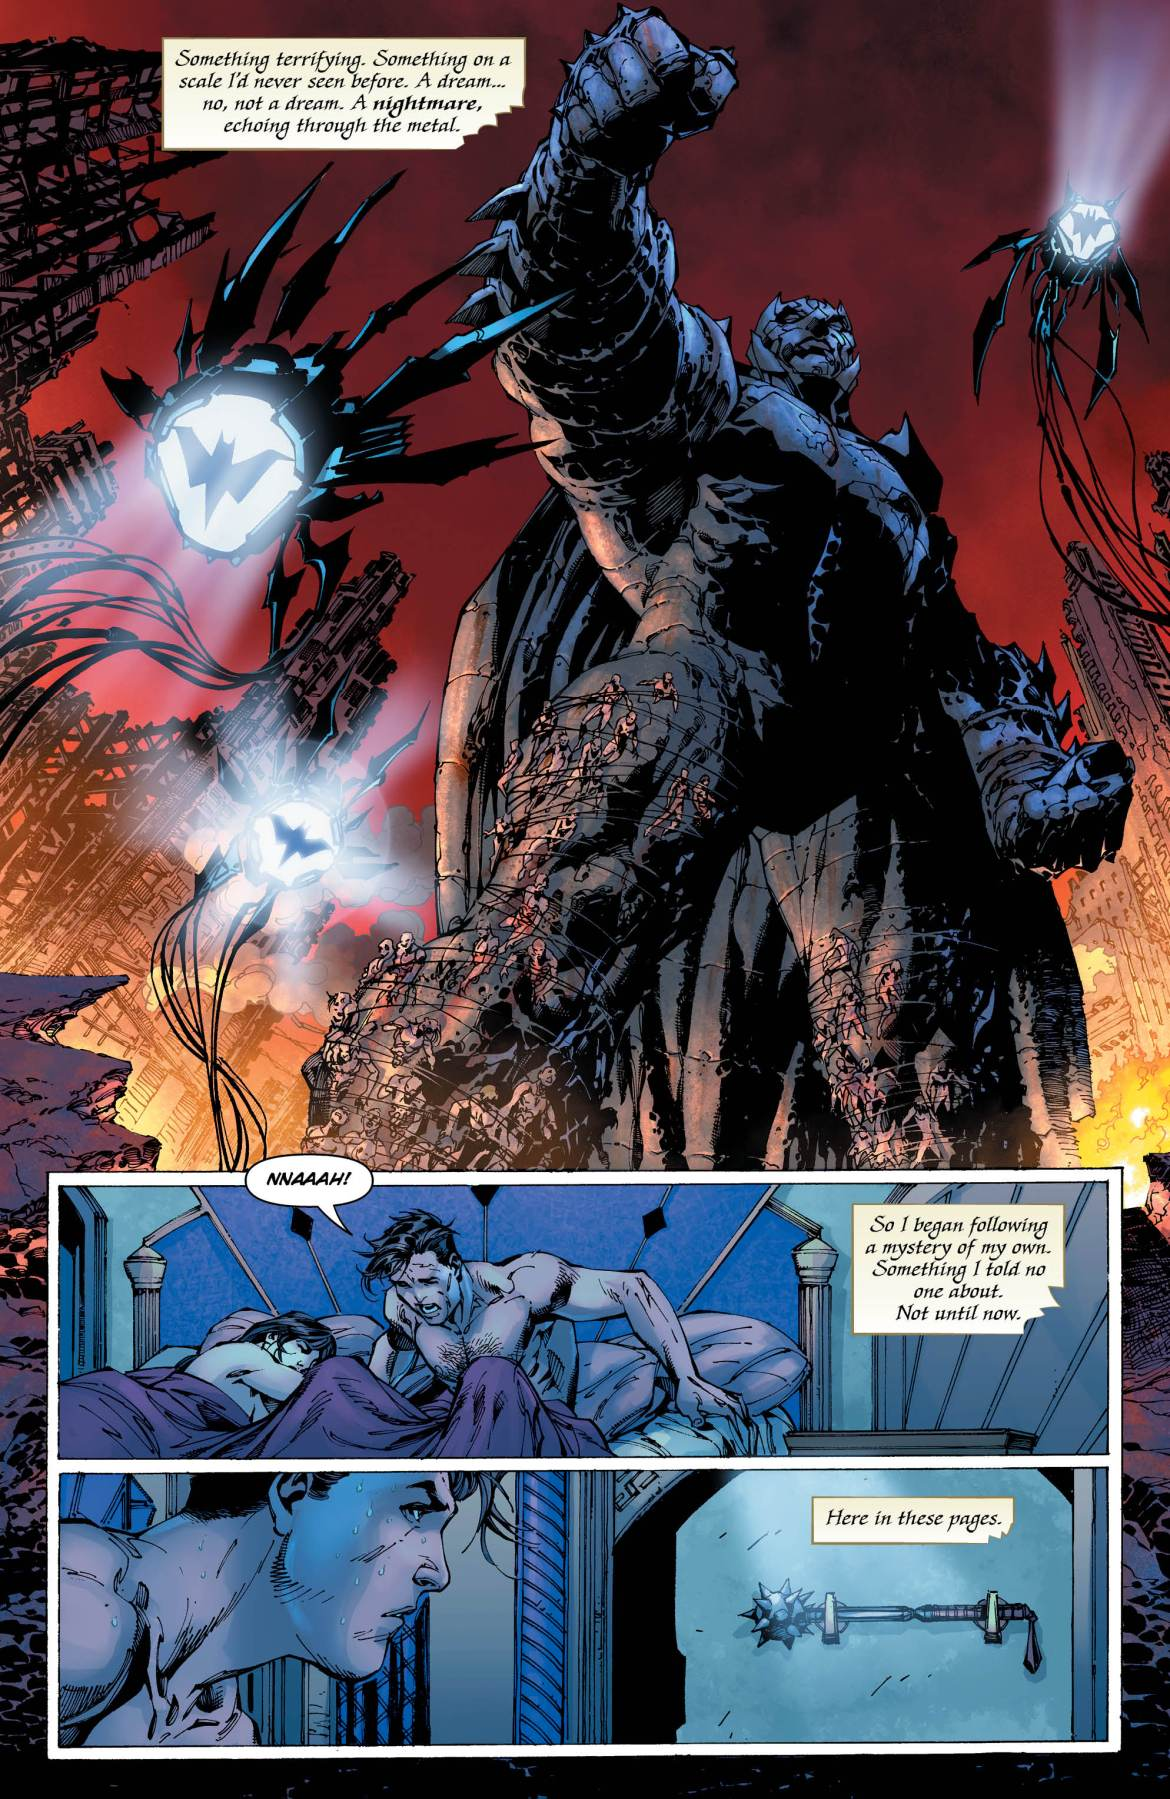 Dark Days The Forge 12 - DC Comics News